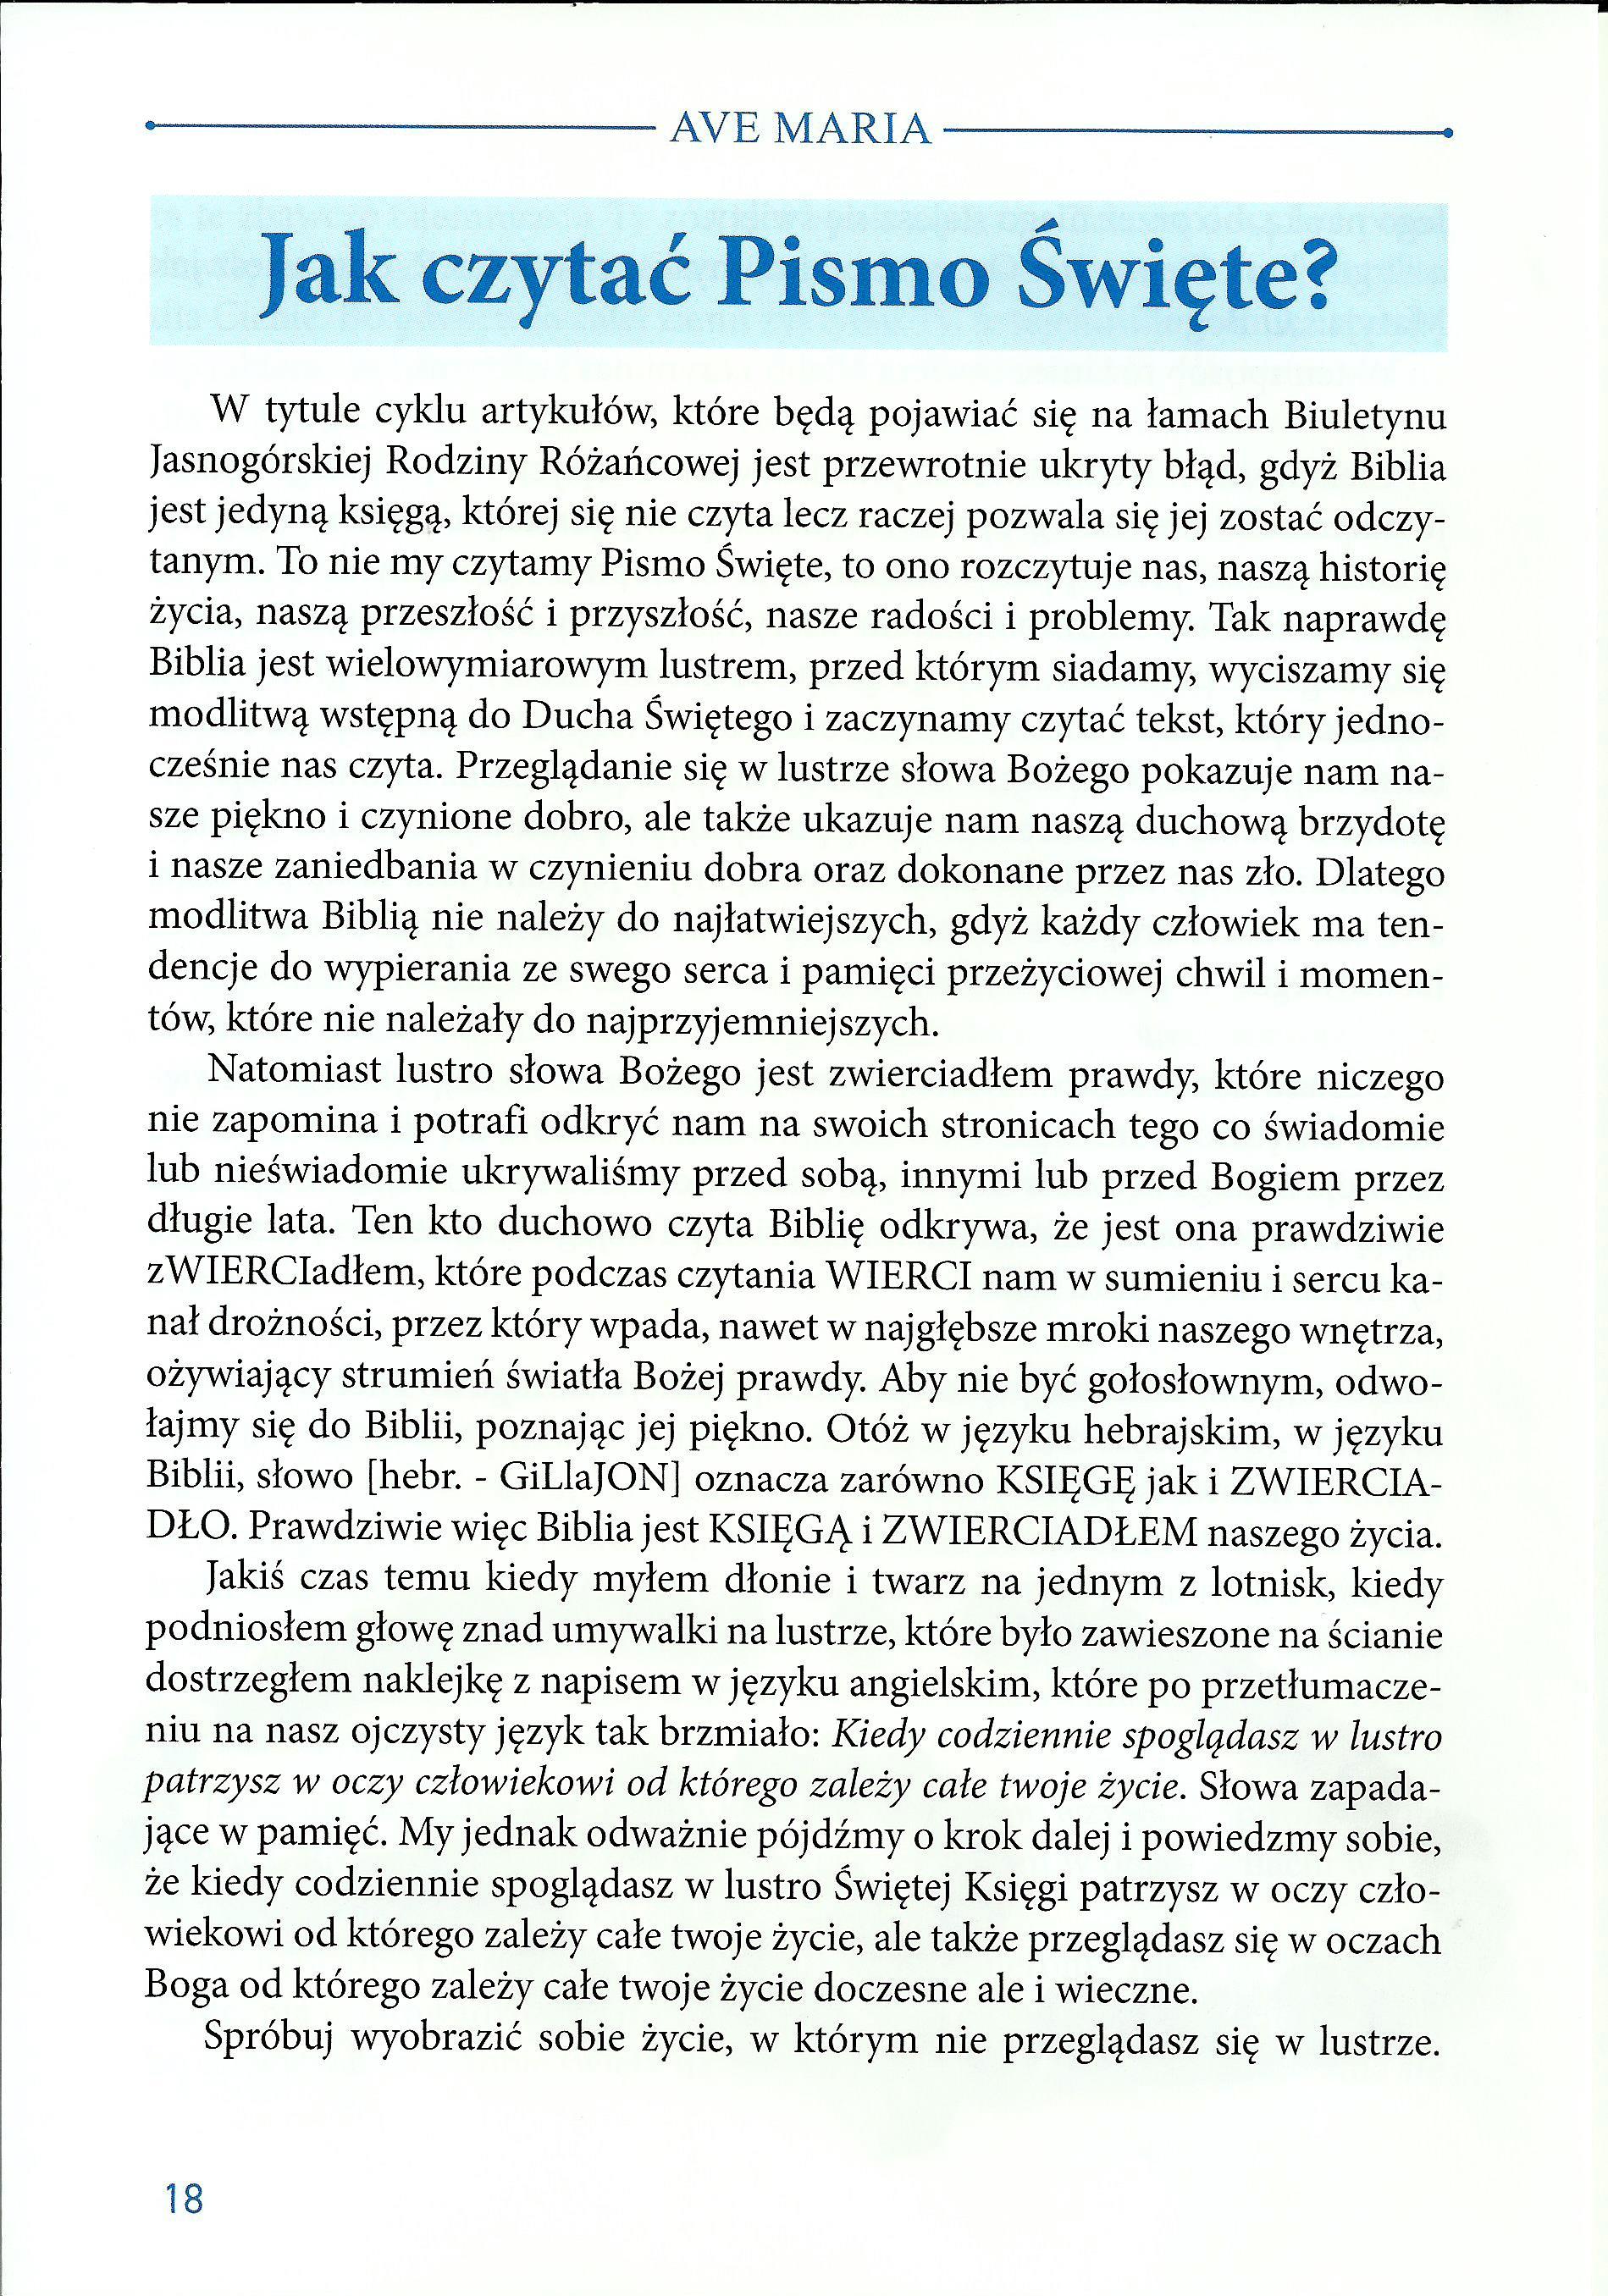 018-jak-cztac-pismo-swiete-18